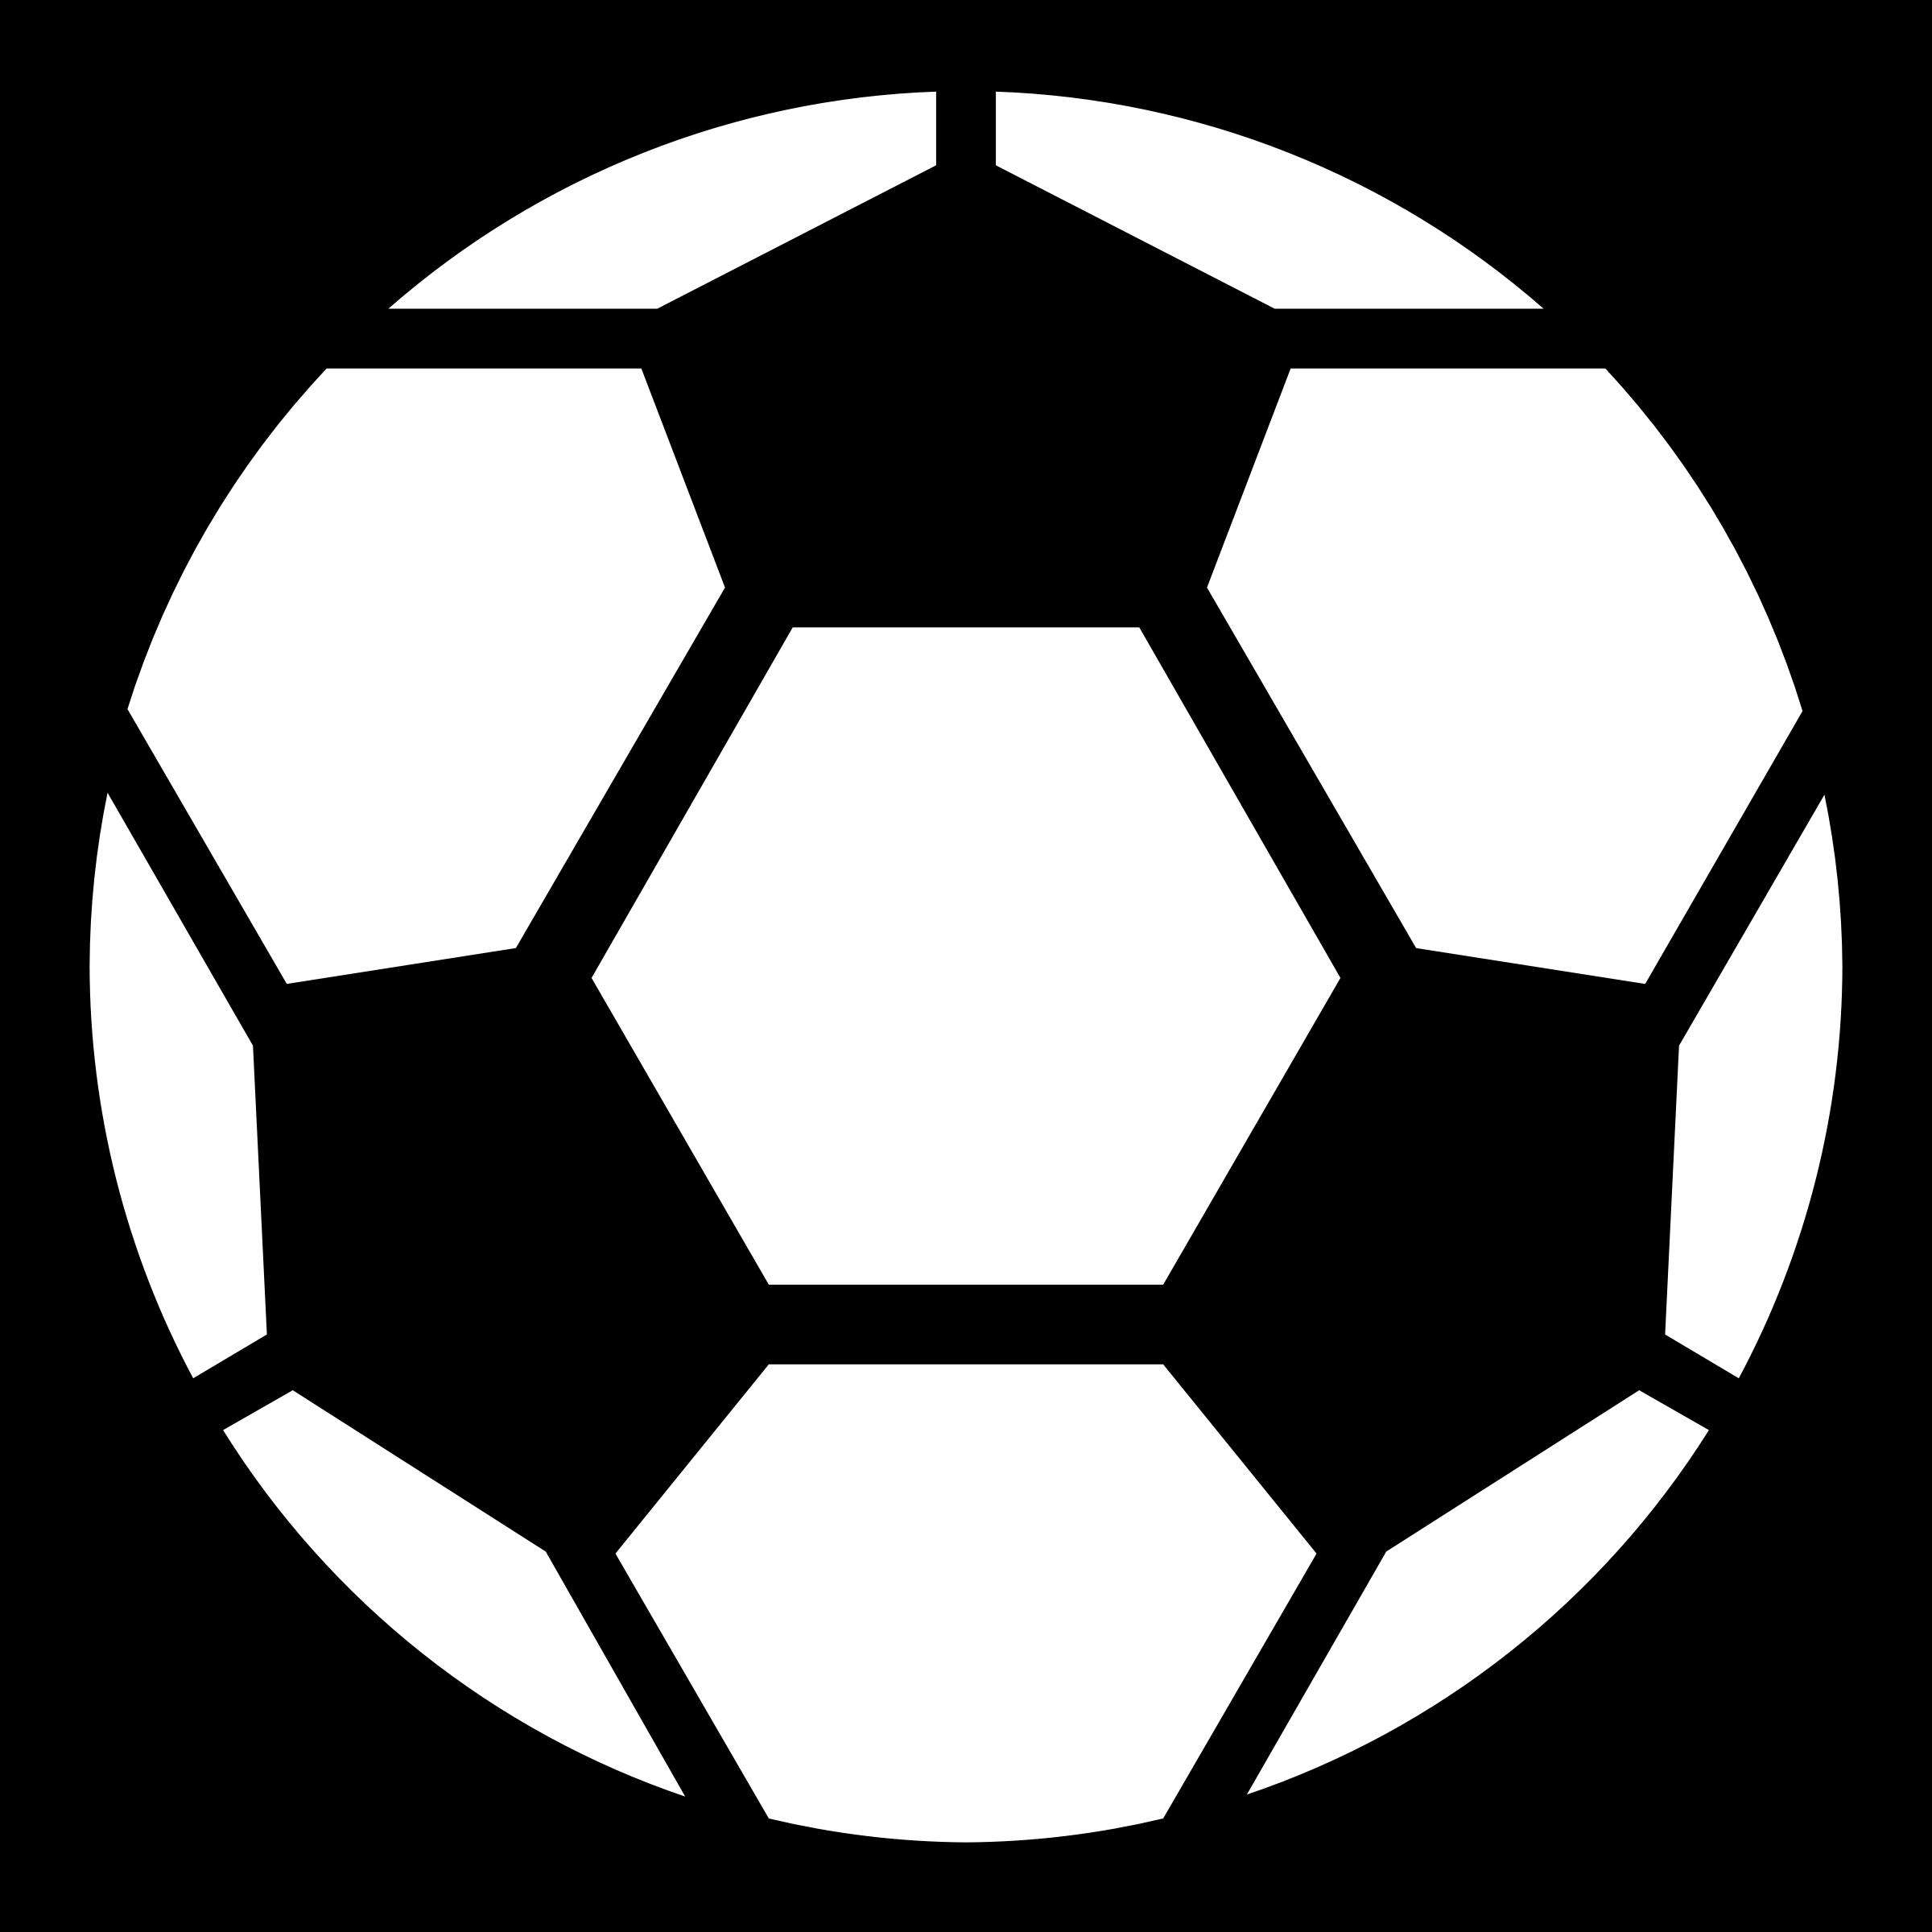 clipart soccer ball rh openclipart org soccer ball pictures clip art soccer ball clipart transparent background